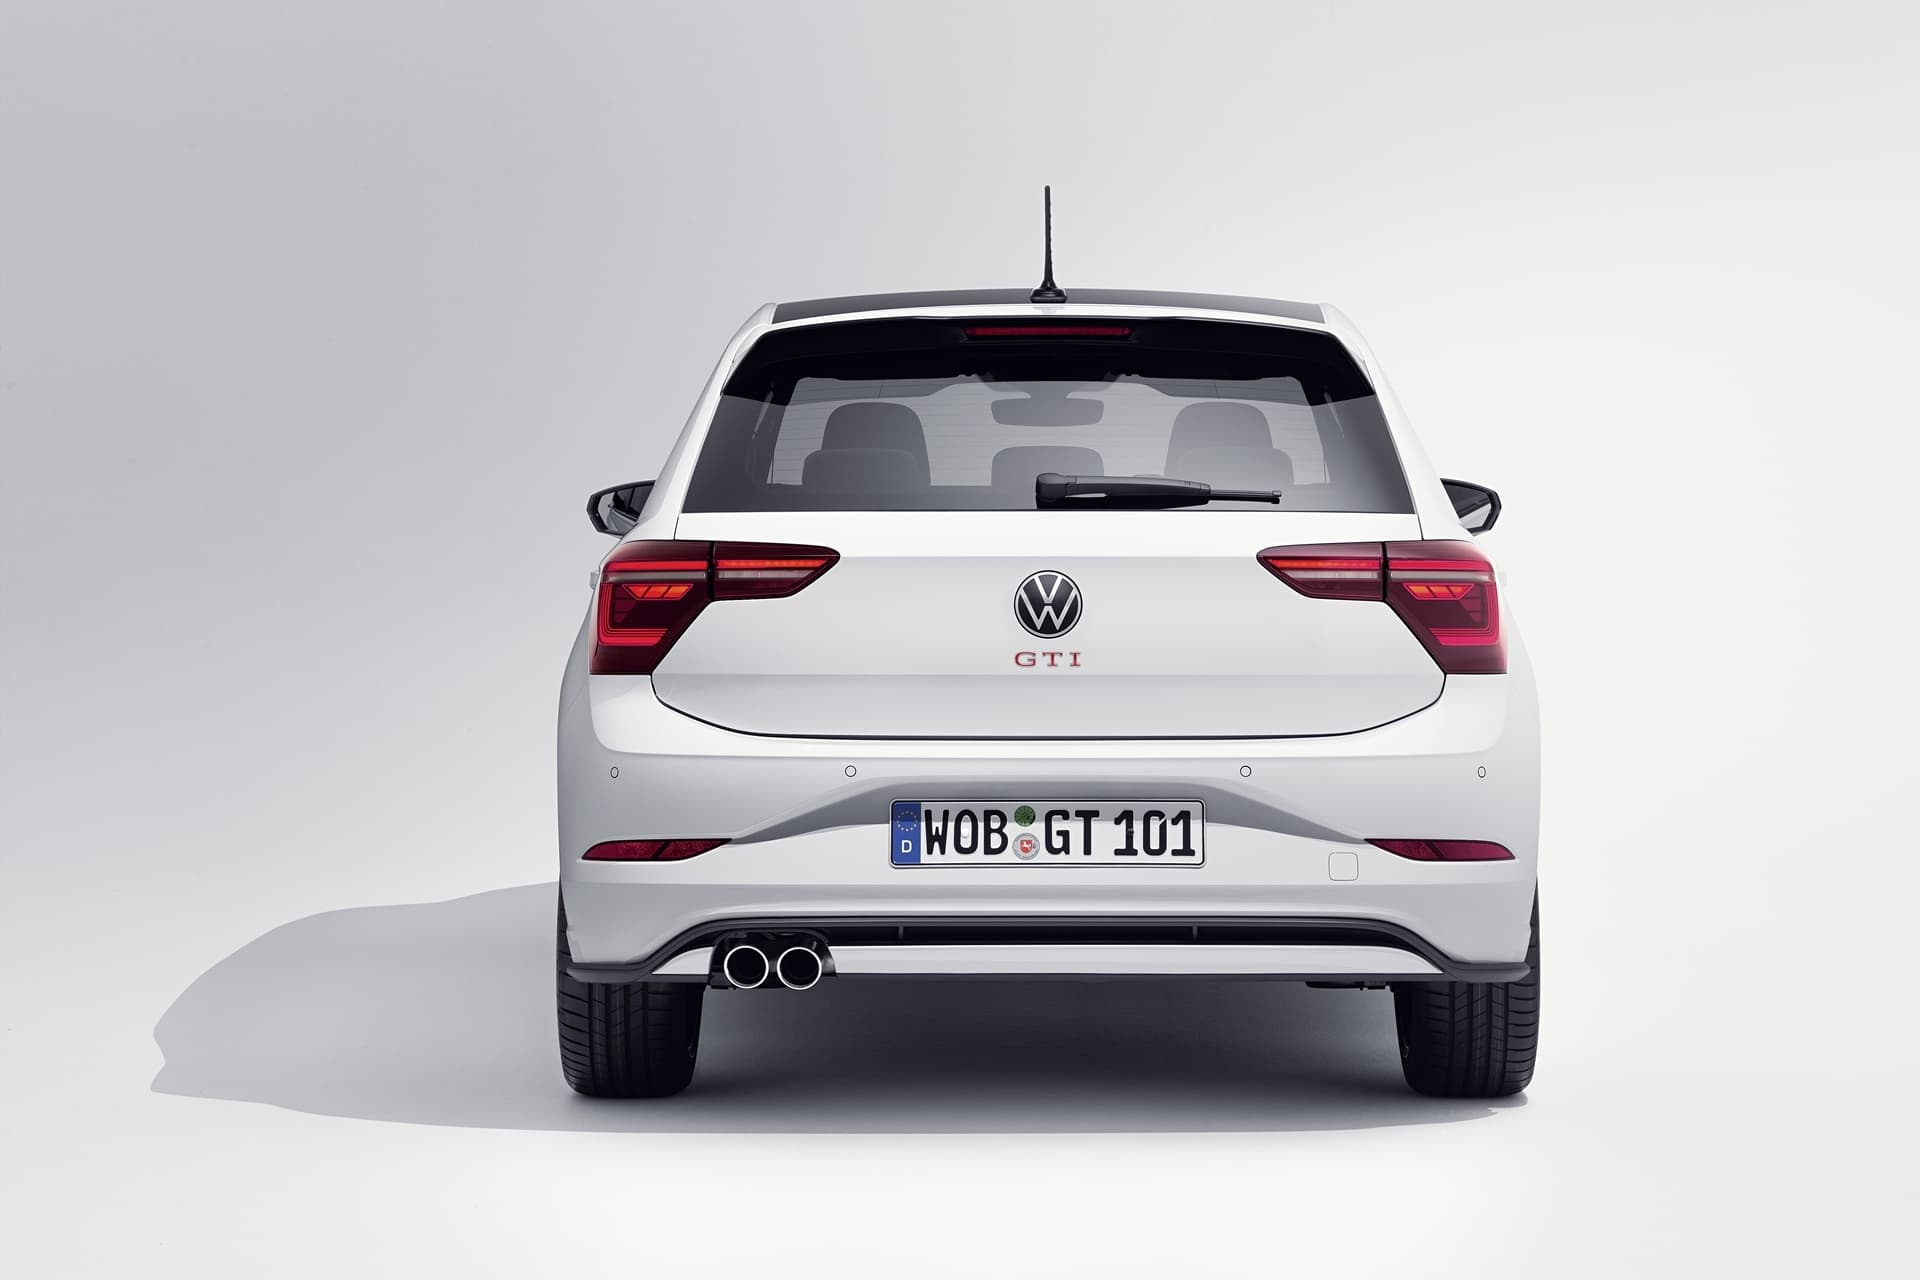 Volkswagen Polo Gti 2022 0621 018